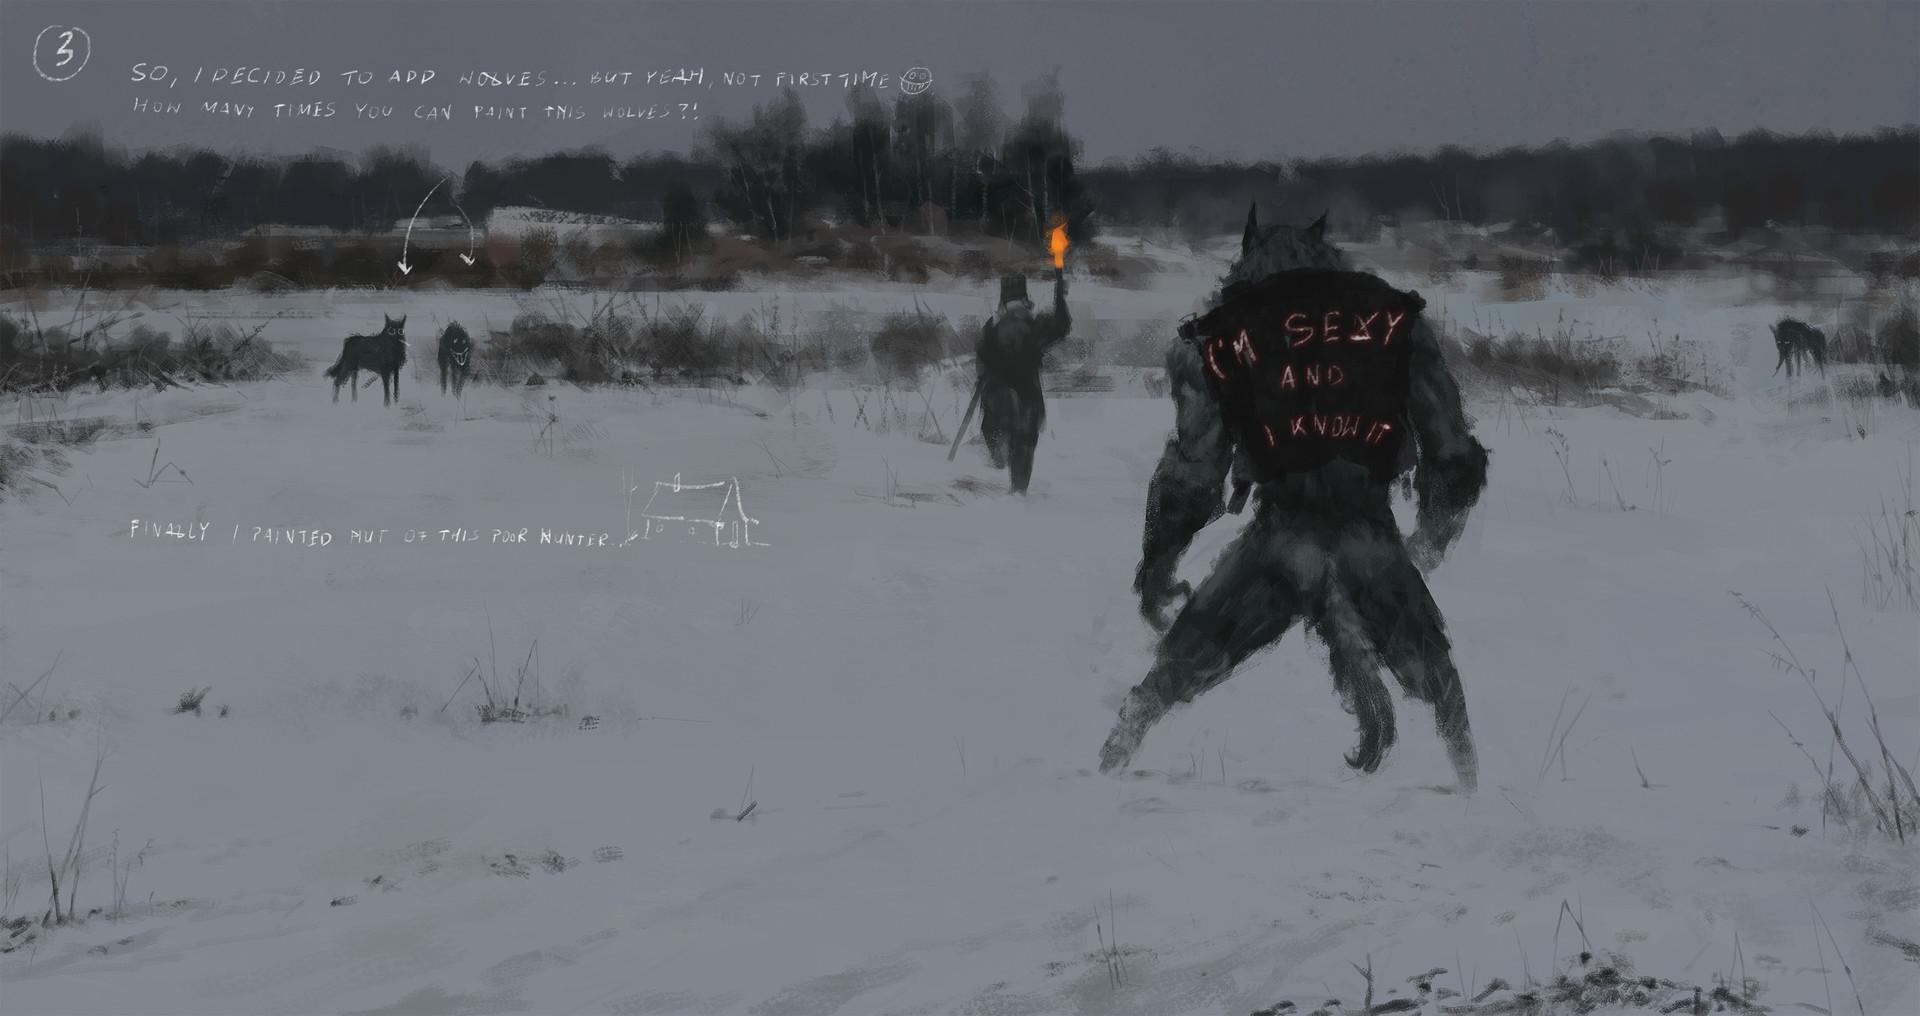 Jakub rozalski wolfpack hunt01 14112016 process04